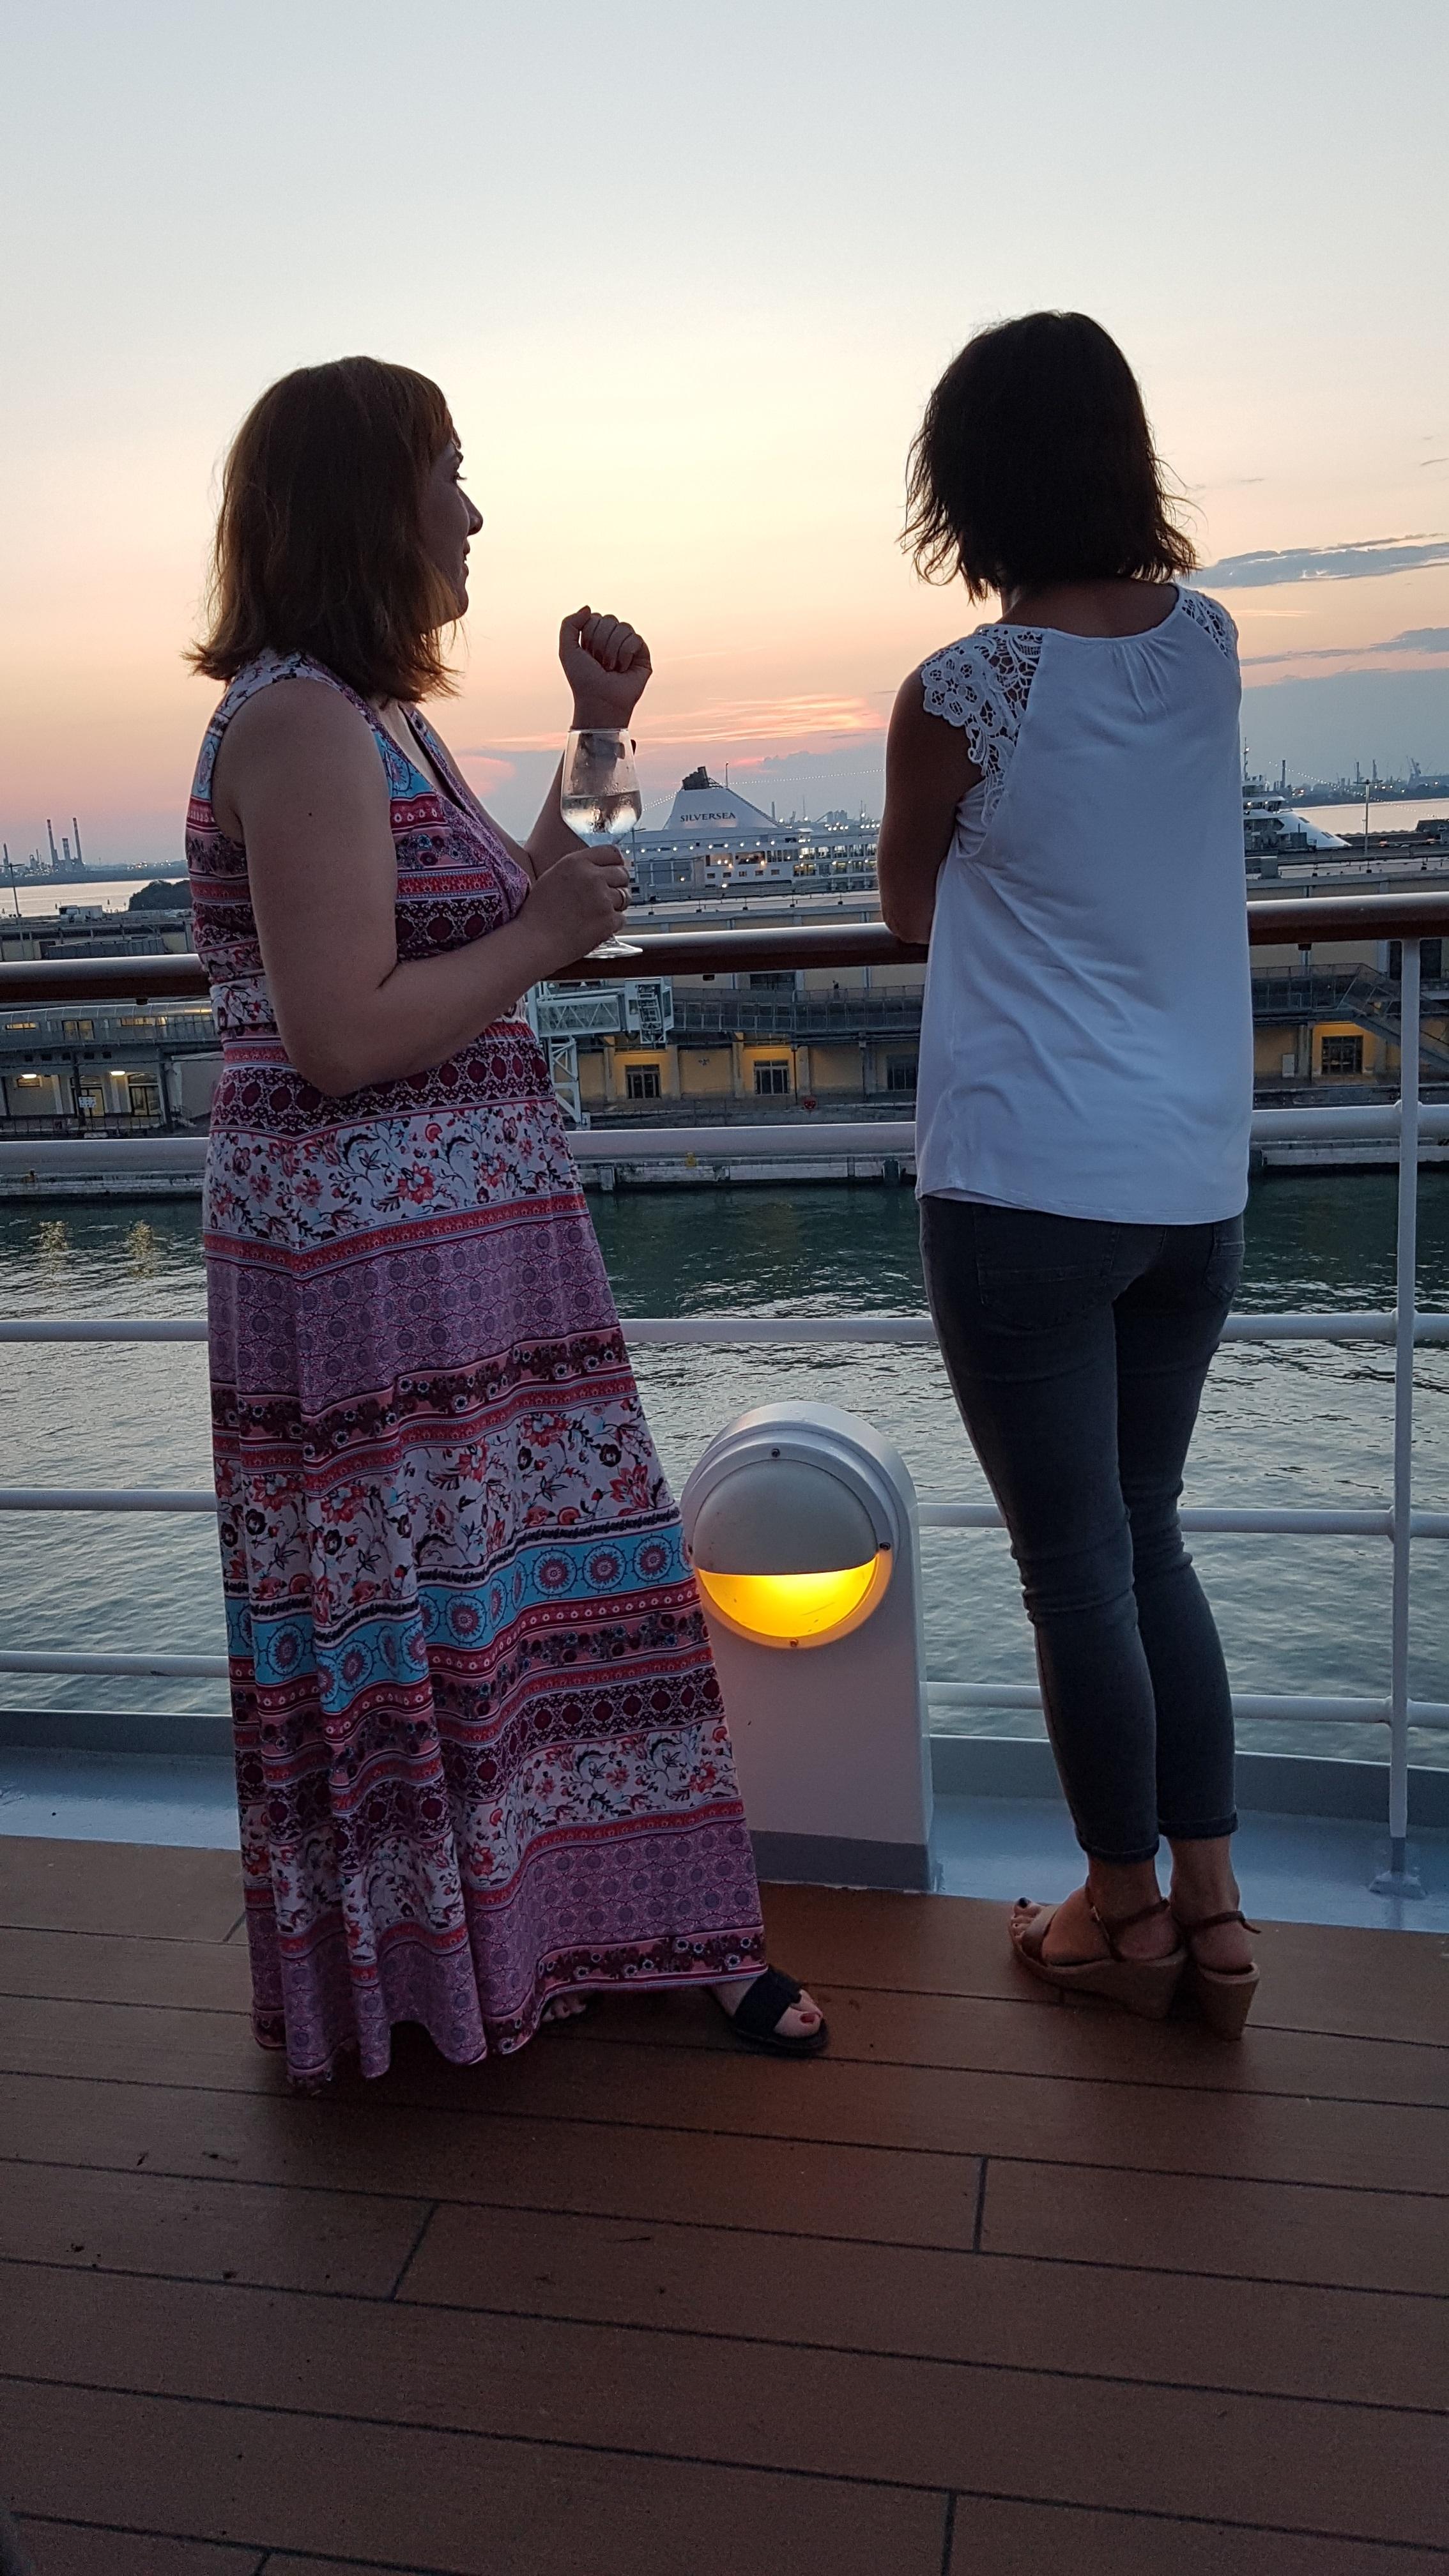 2Ladies_Reling_Venedig_Sonnenuntergang_Hochformat.jpg